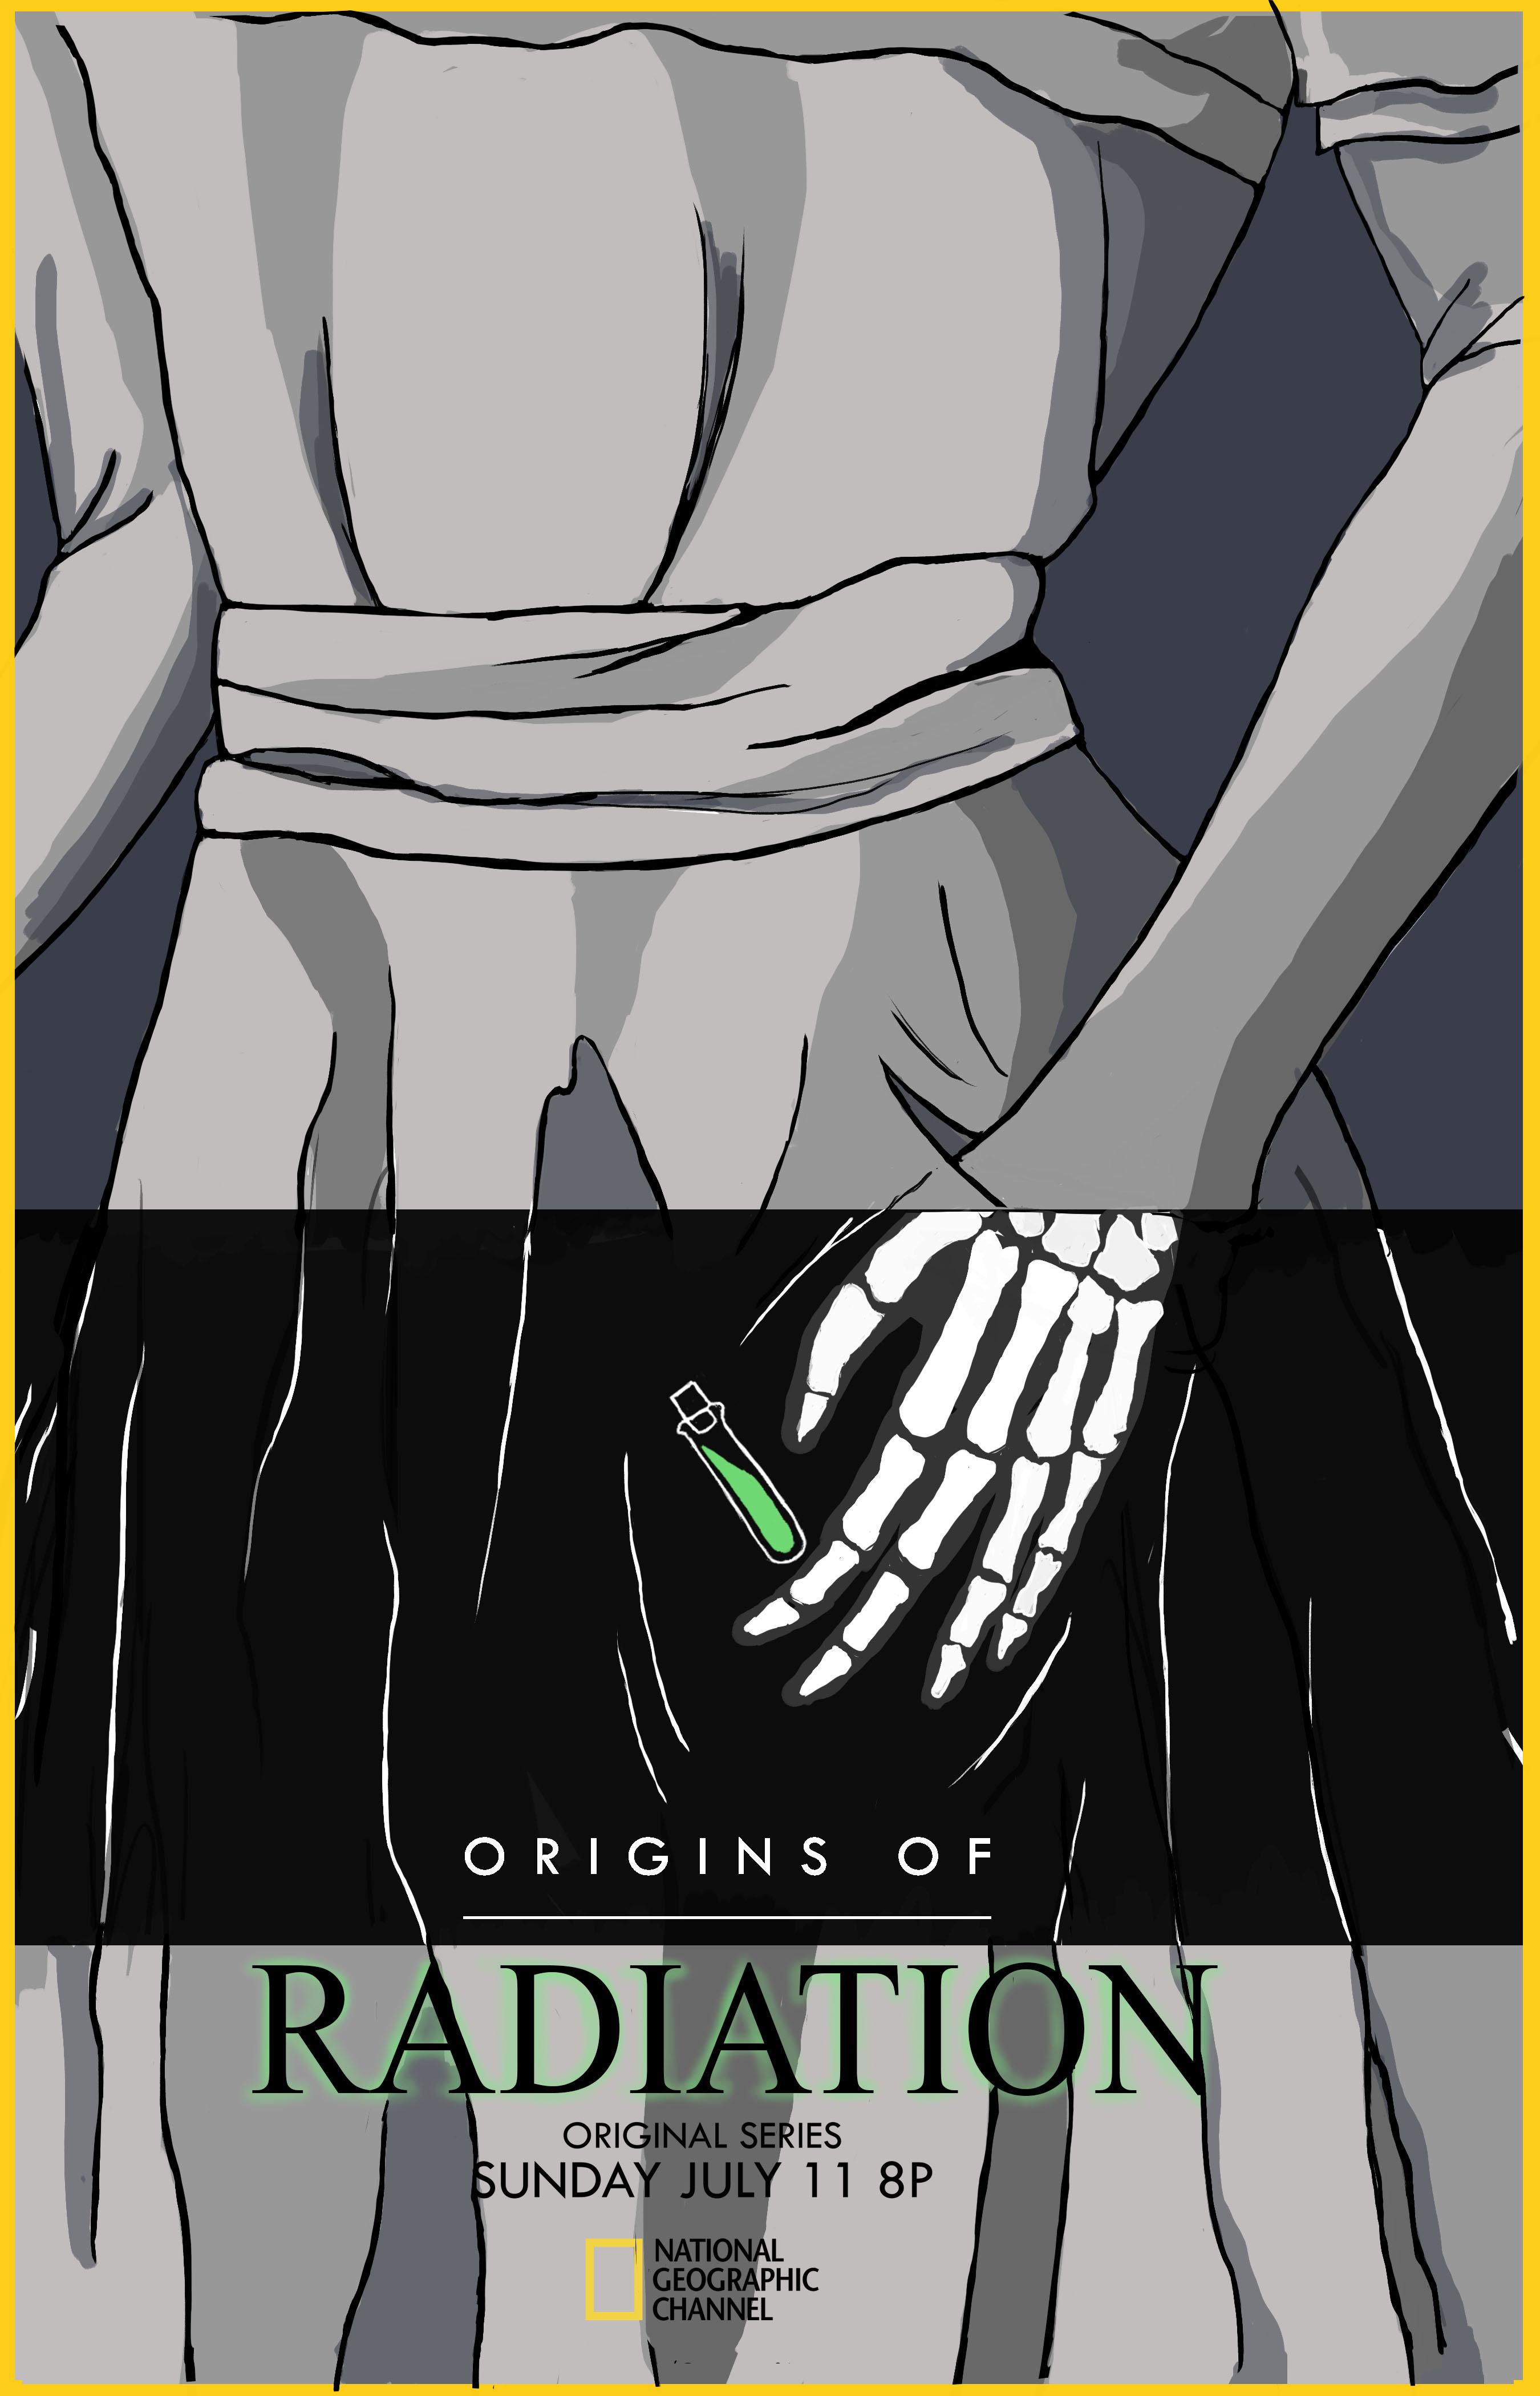 Origins of Radiation